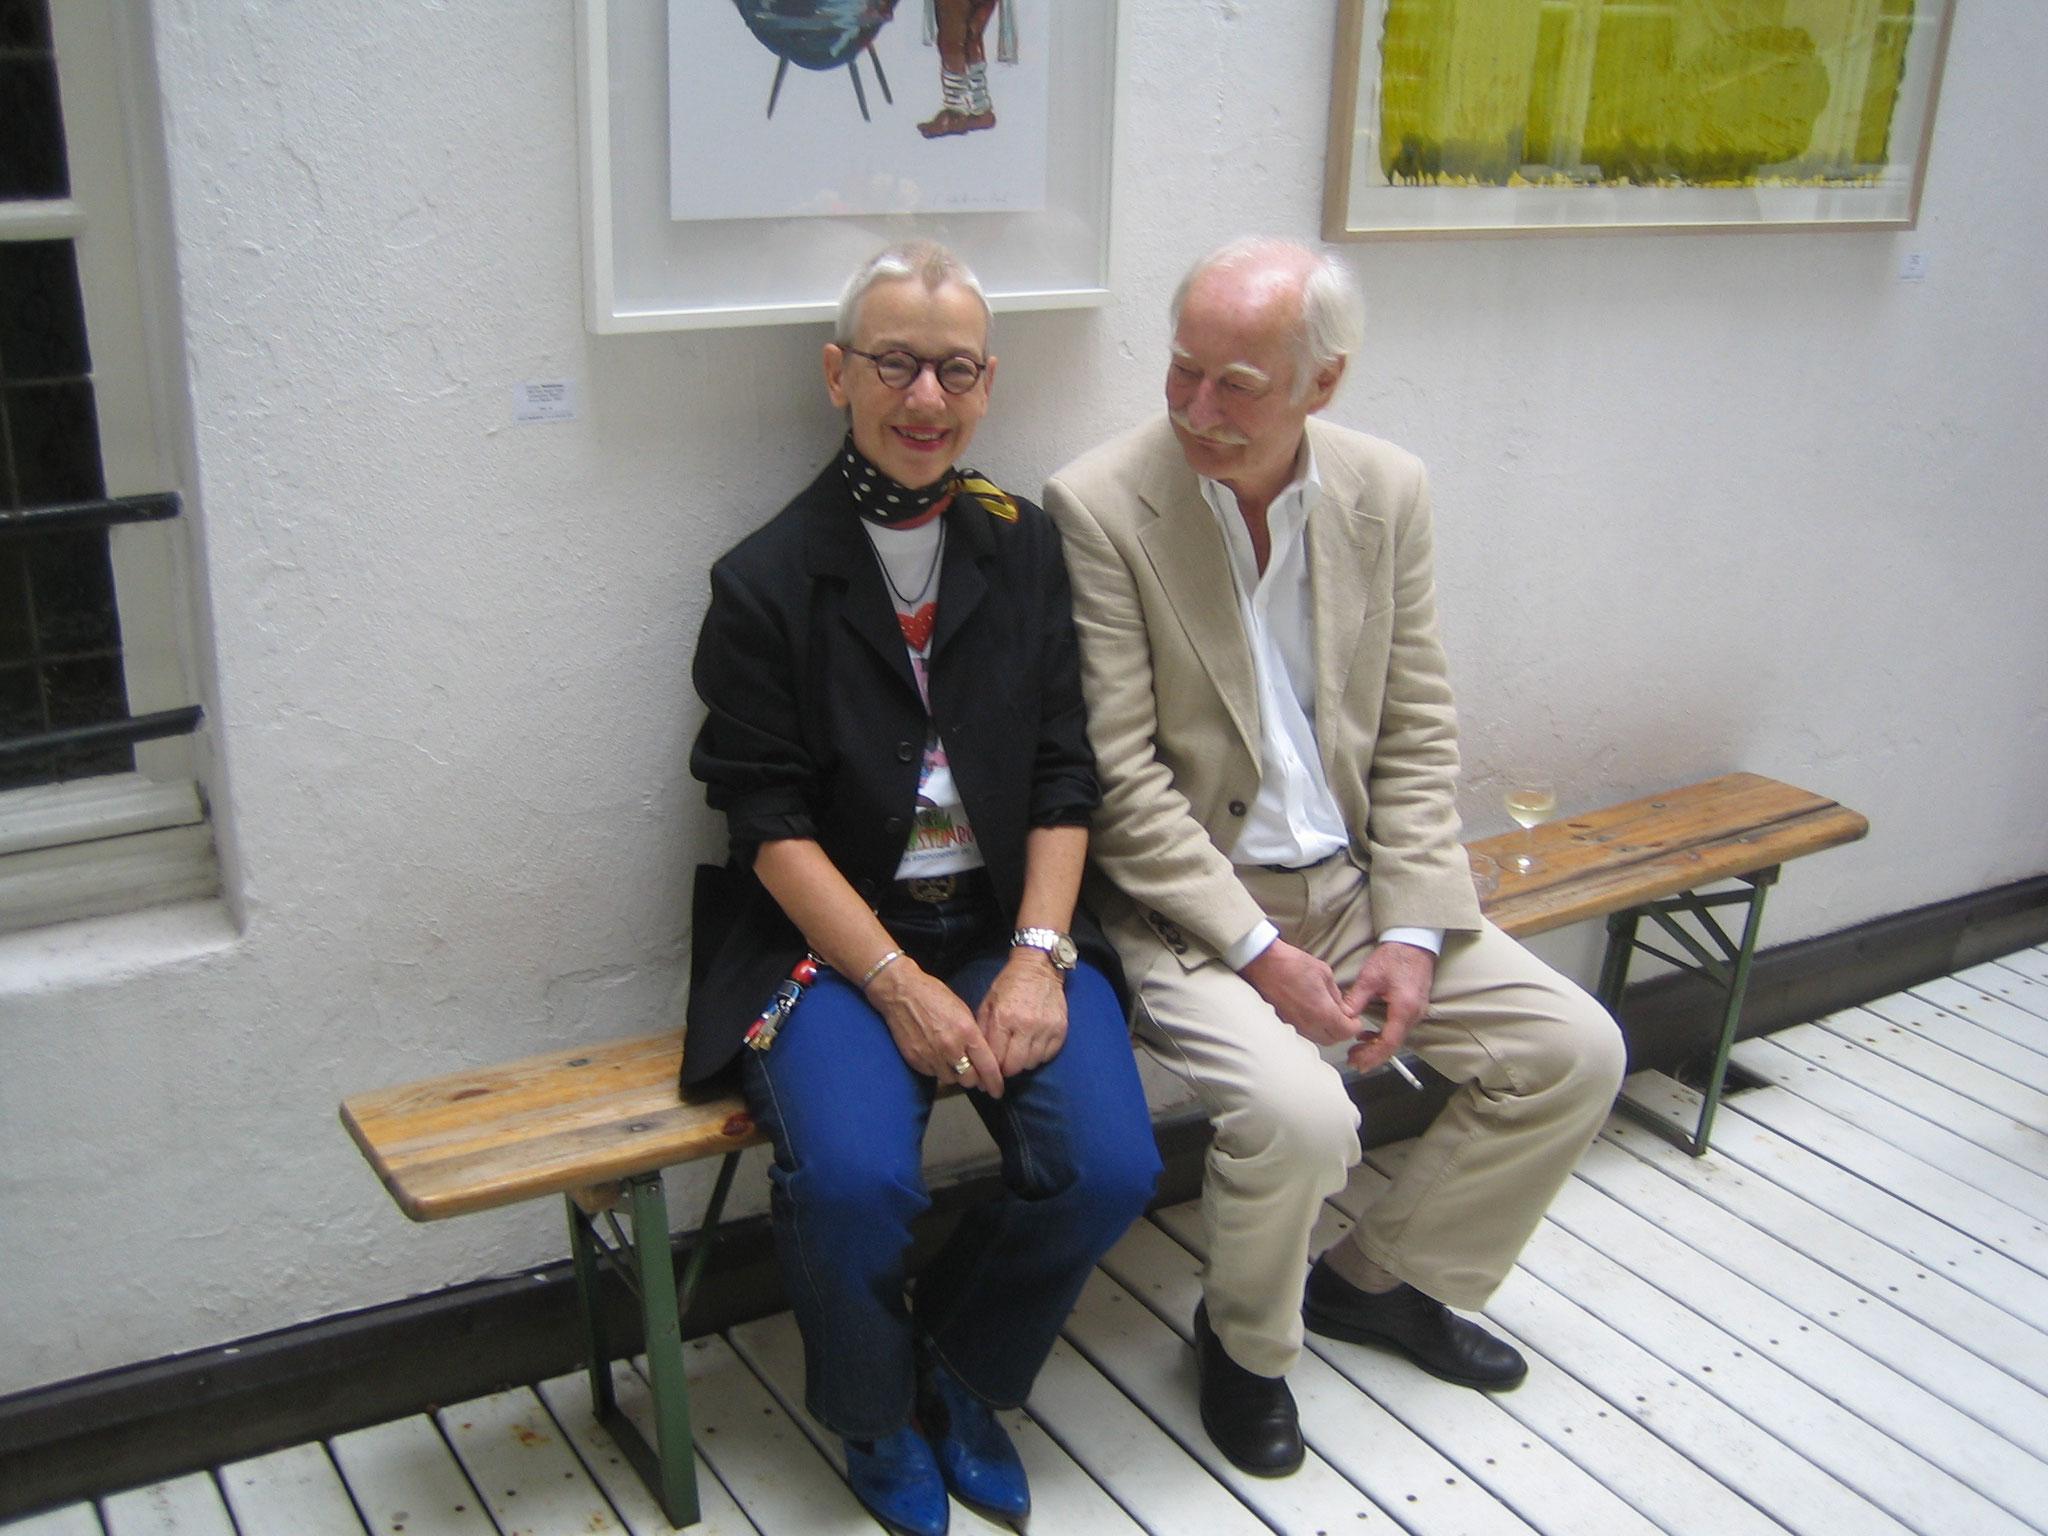 40 J.Galerie mit Fritz Meckseper